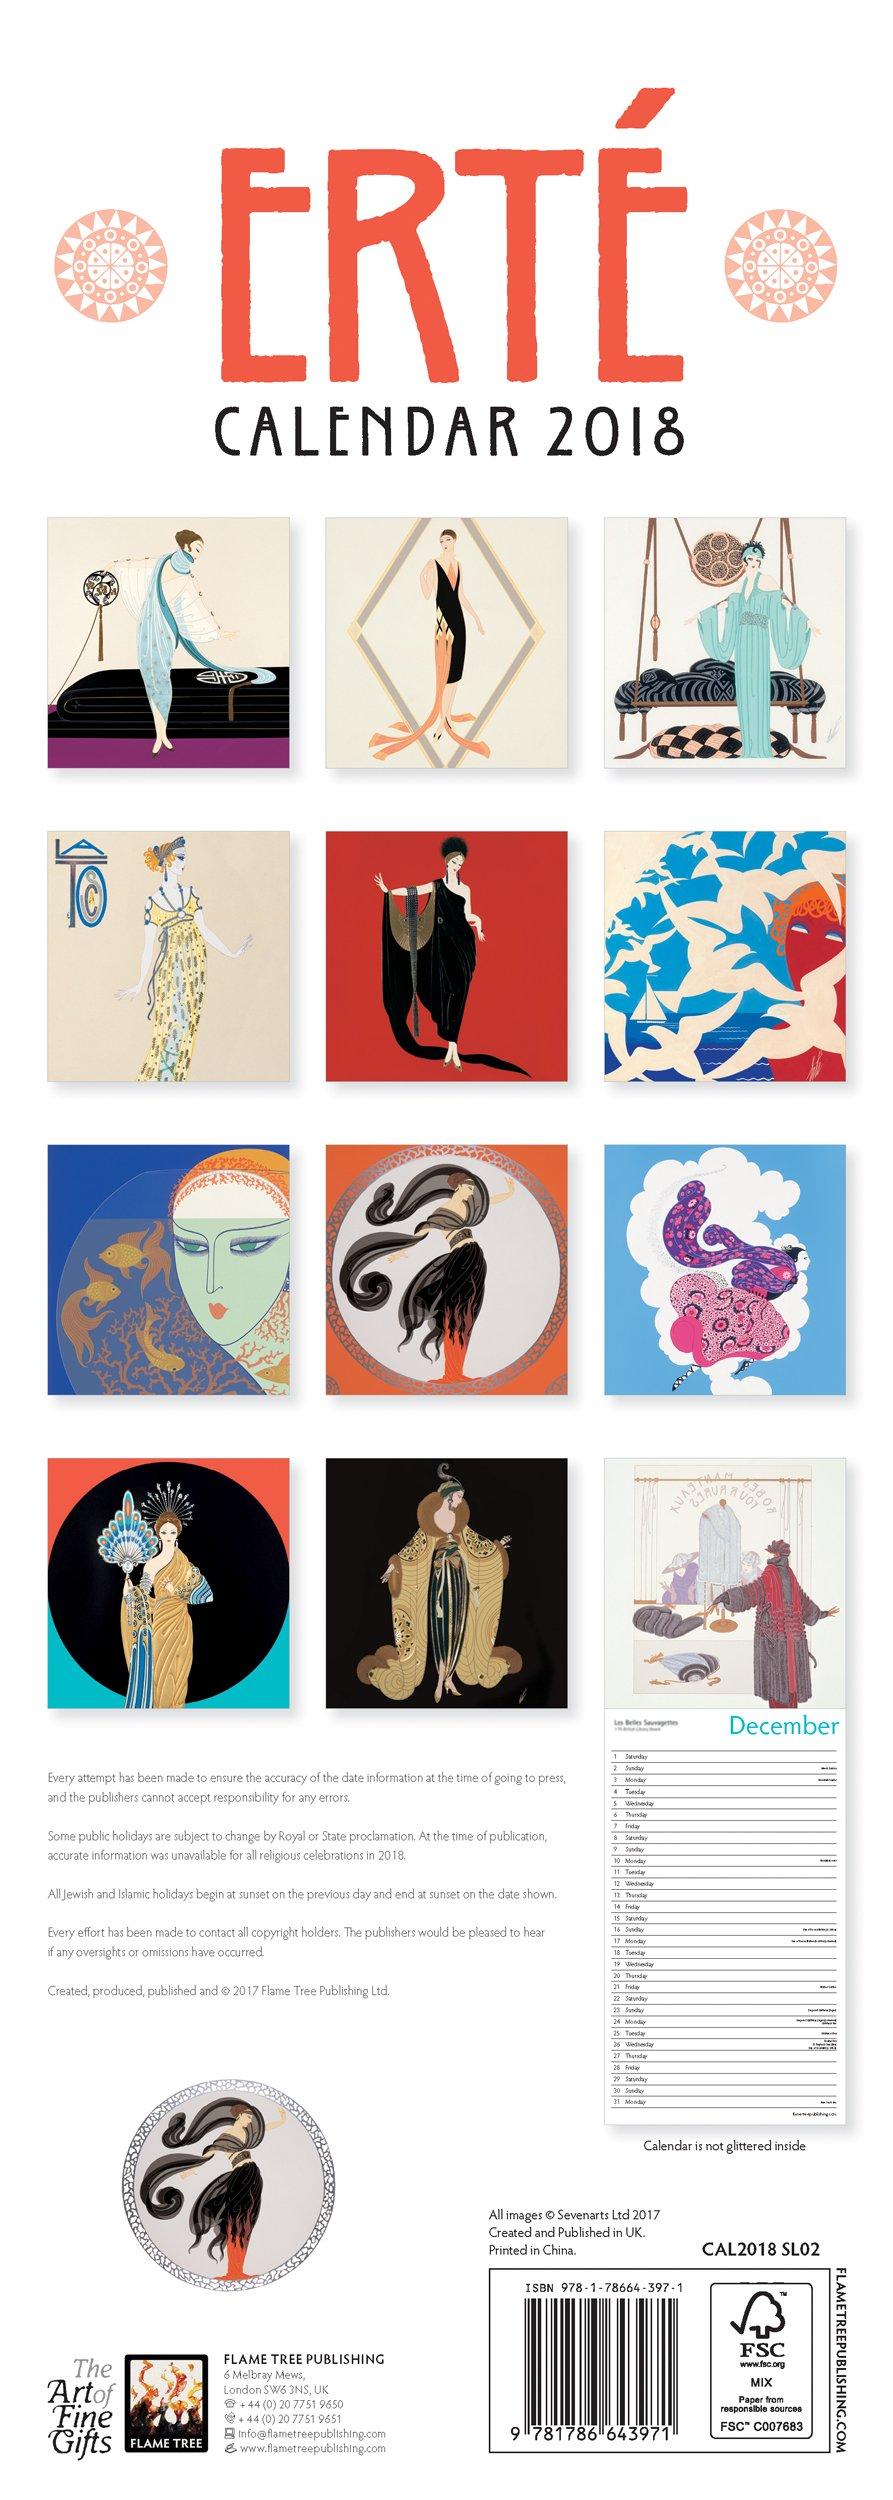 Erté slim calendar 2018 (Art Calendar): Amazon.co.uk: Flame Tree  Publishing: 9781786643971: Books